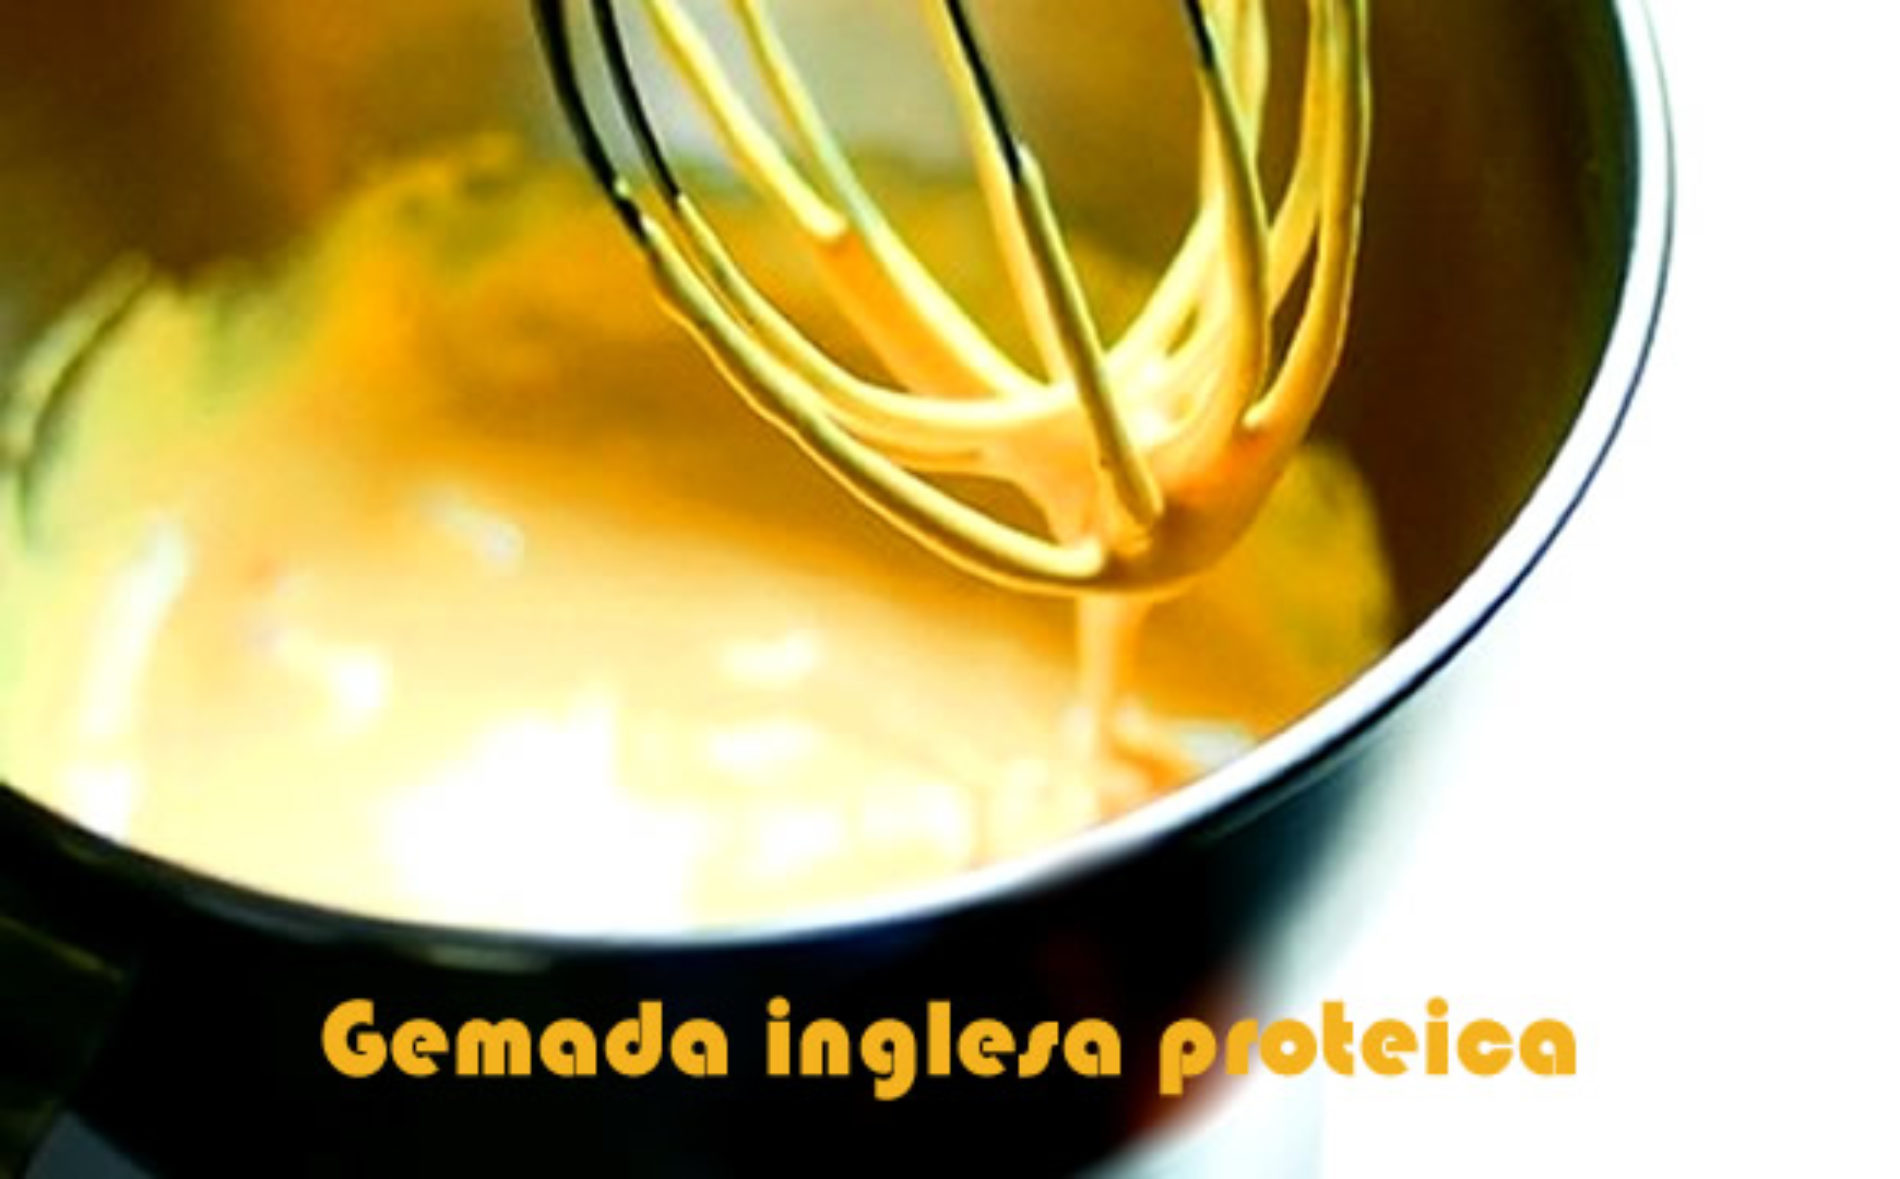 Gemada inglesa proteica